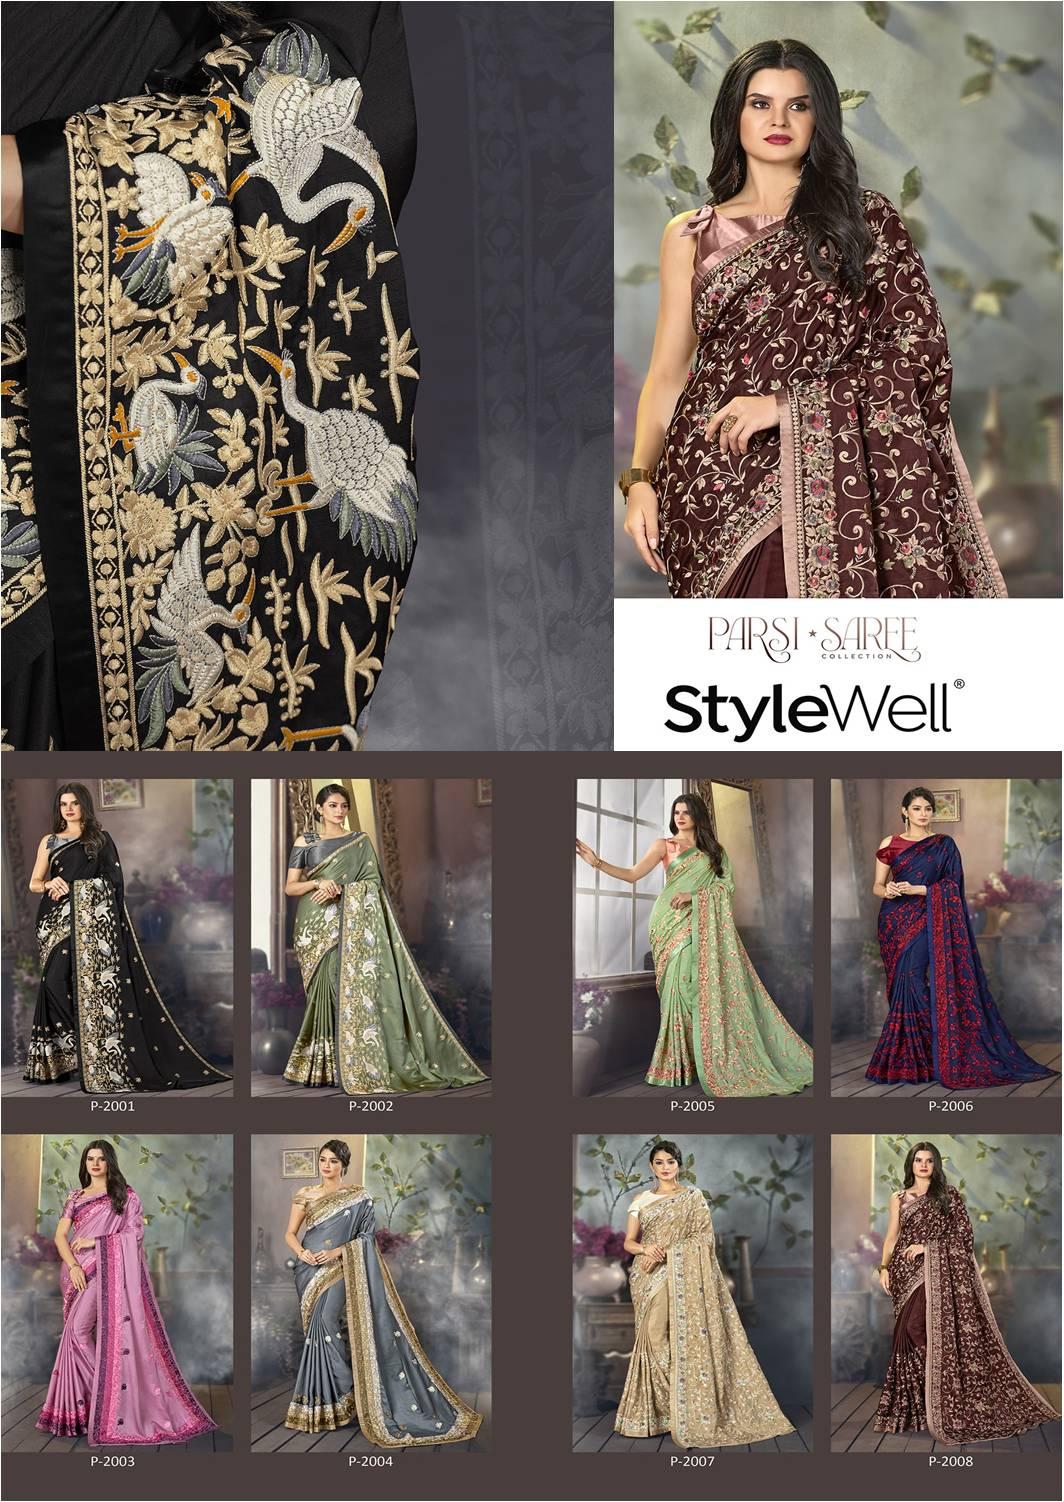 Parsi Saree StyleWell Vol.1